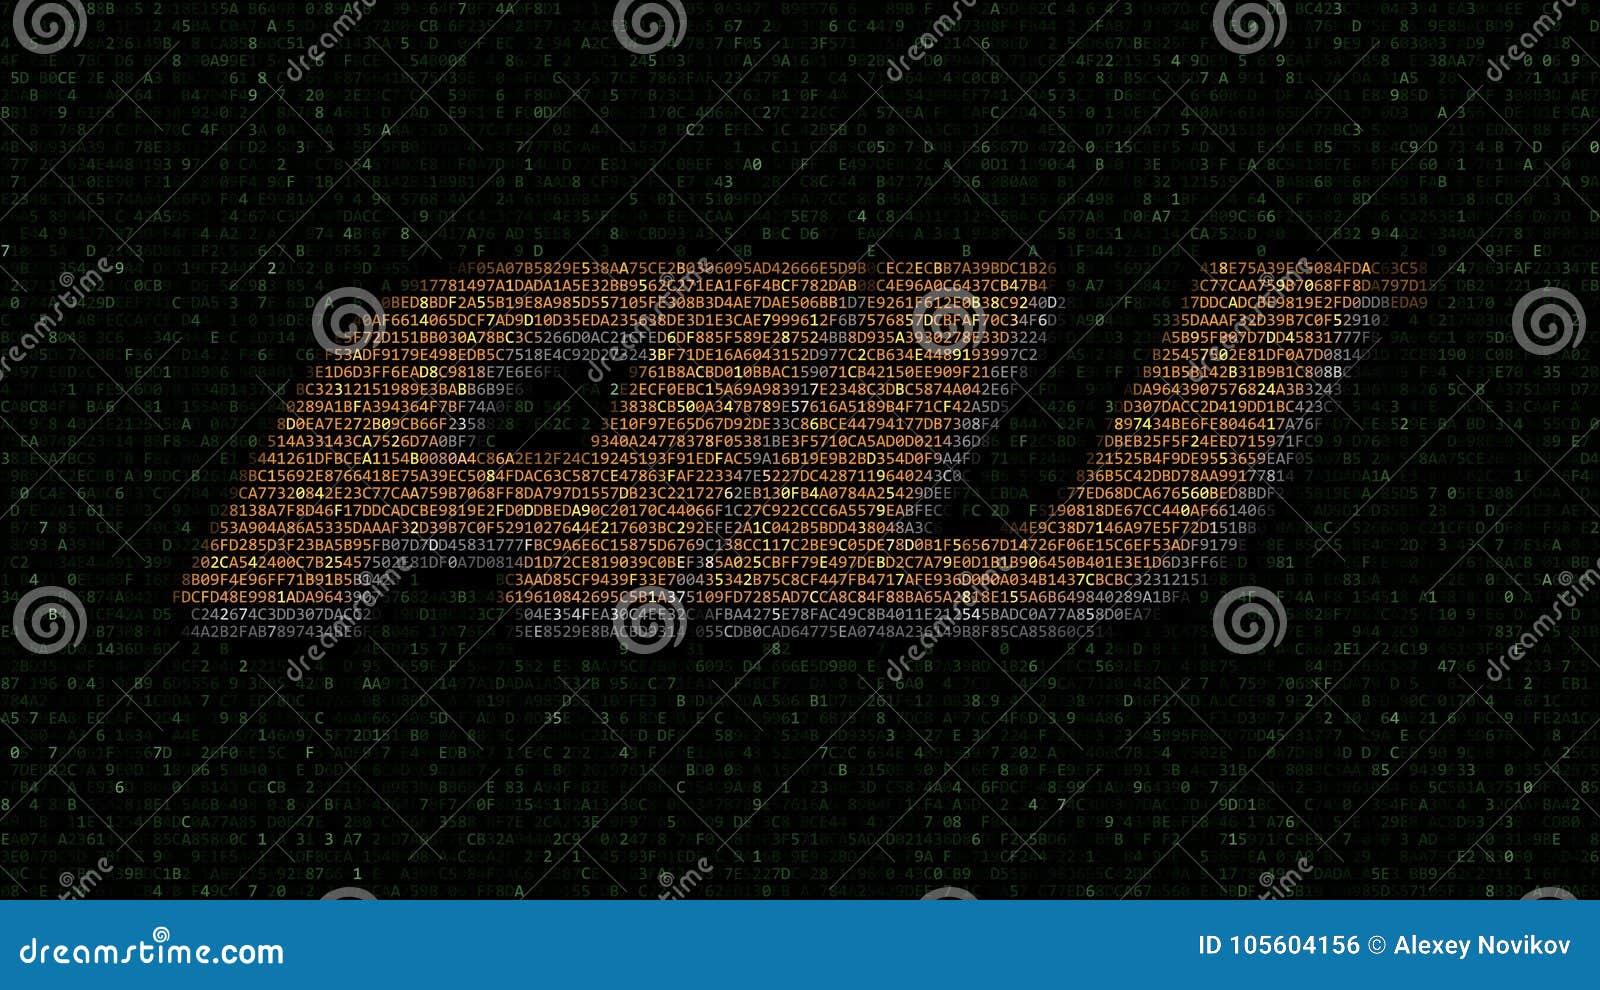 Au Mobile Phone Company Logo Made Of Hexadecimal Symbols On Computer